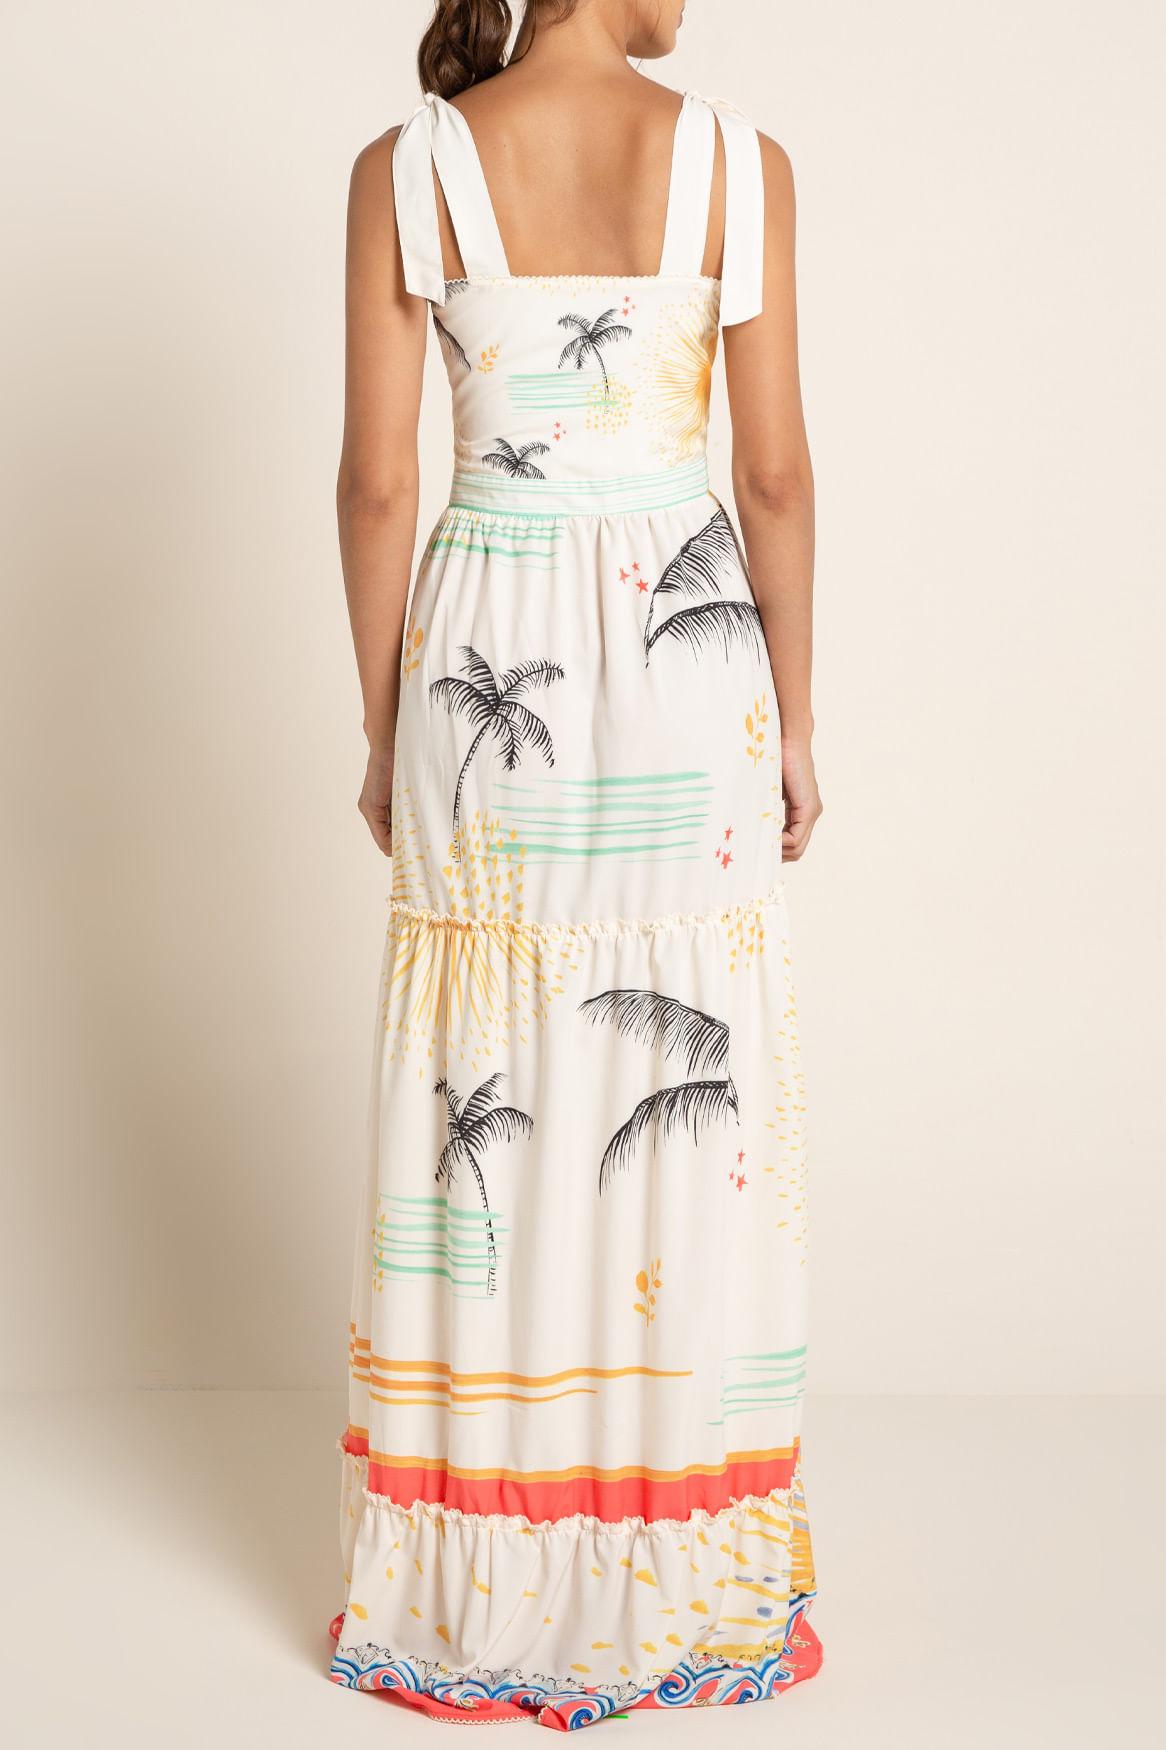 Herbarium Dress